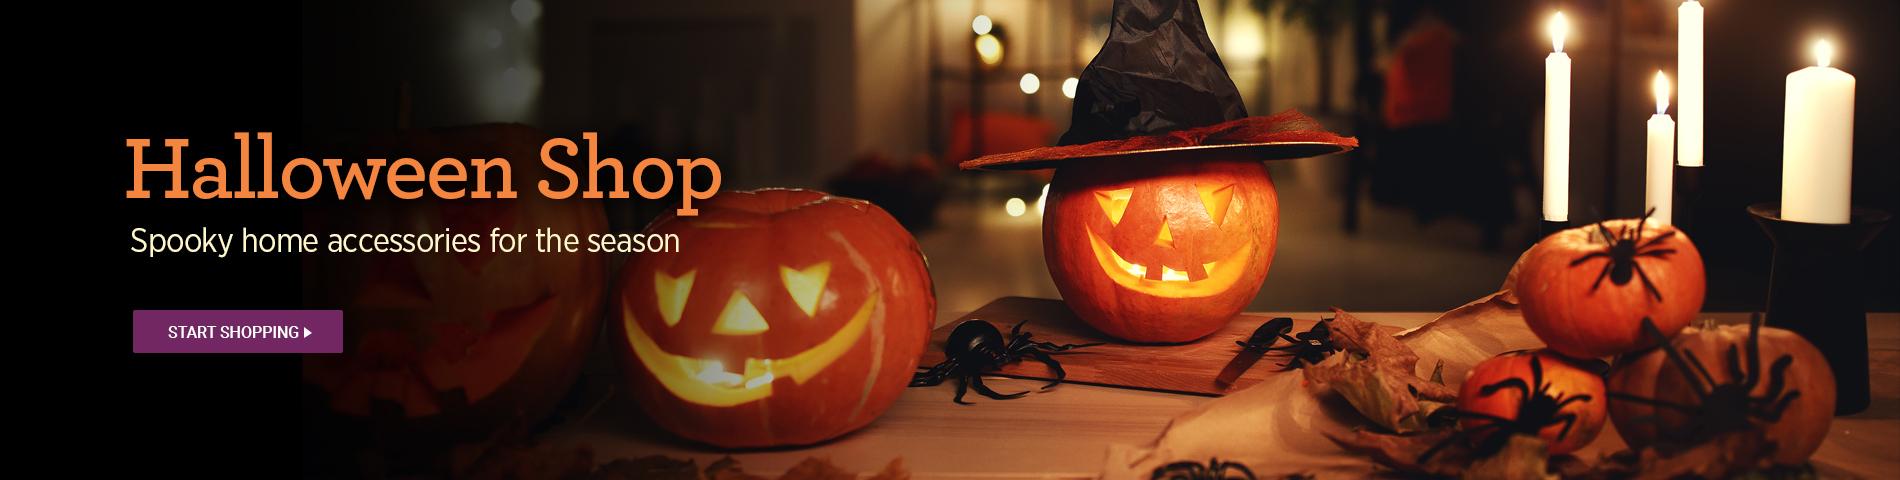 Shop All Halloween Decor